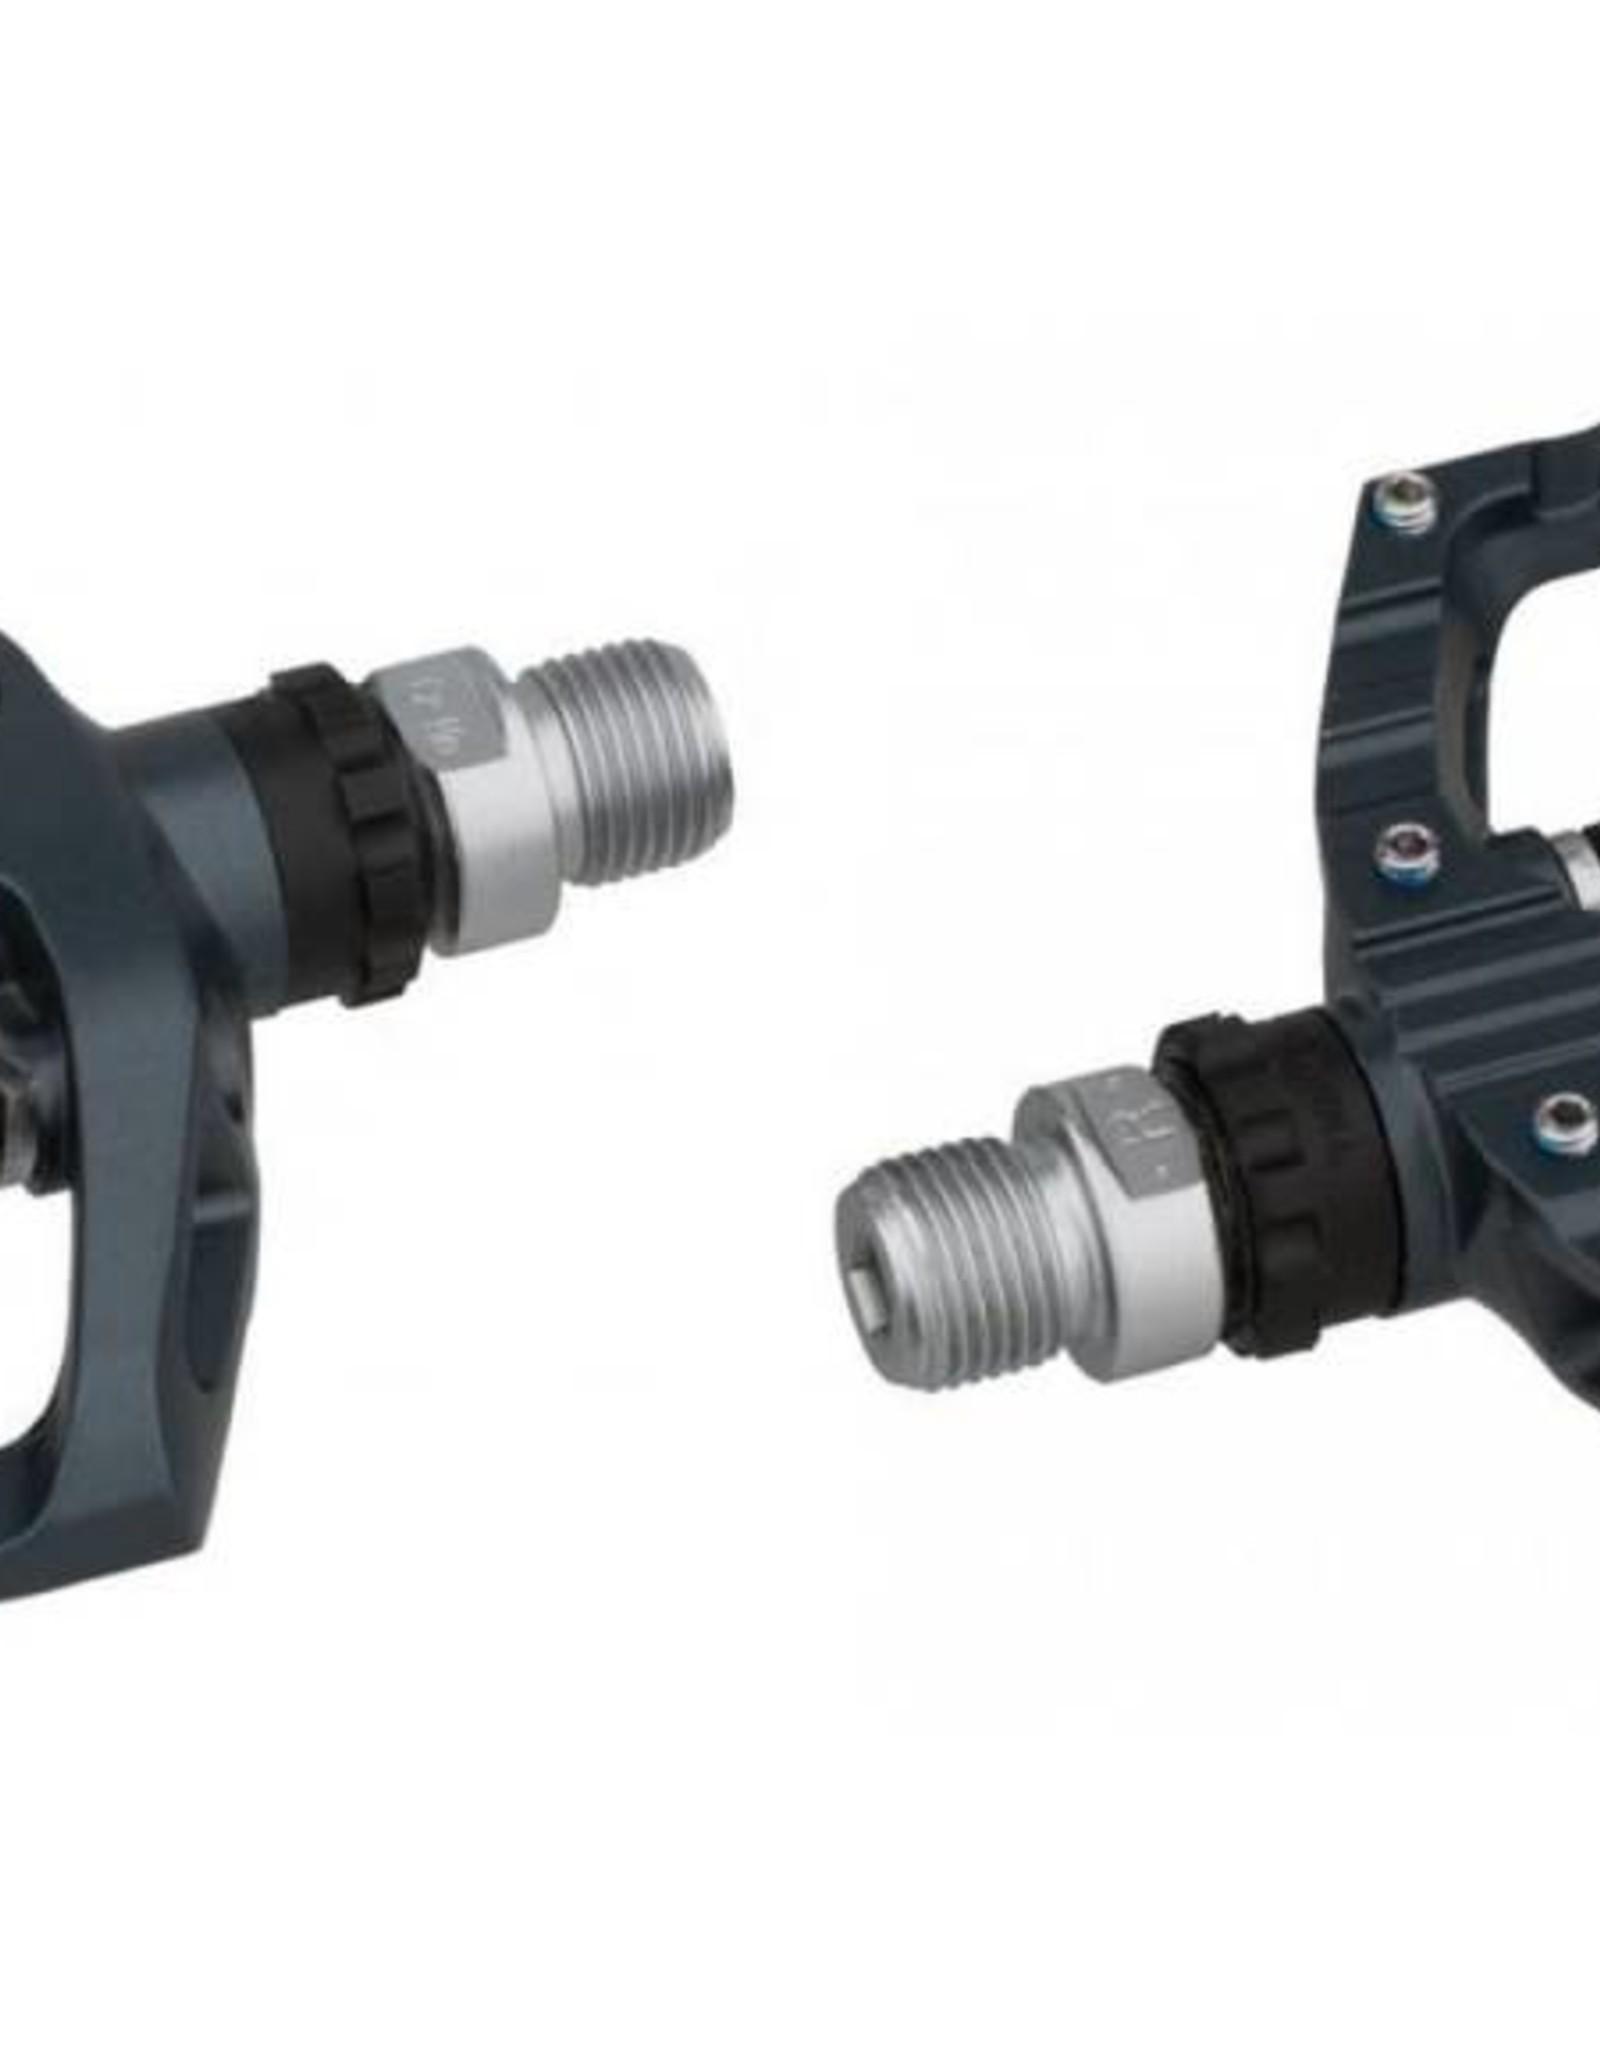 Shimano Shimano PD-EH500 SPD/Platform Pedals